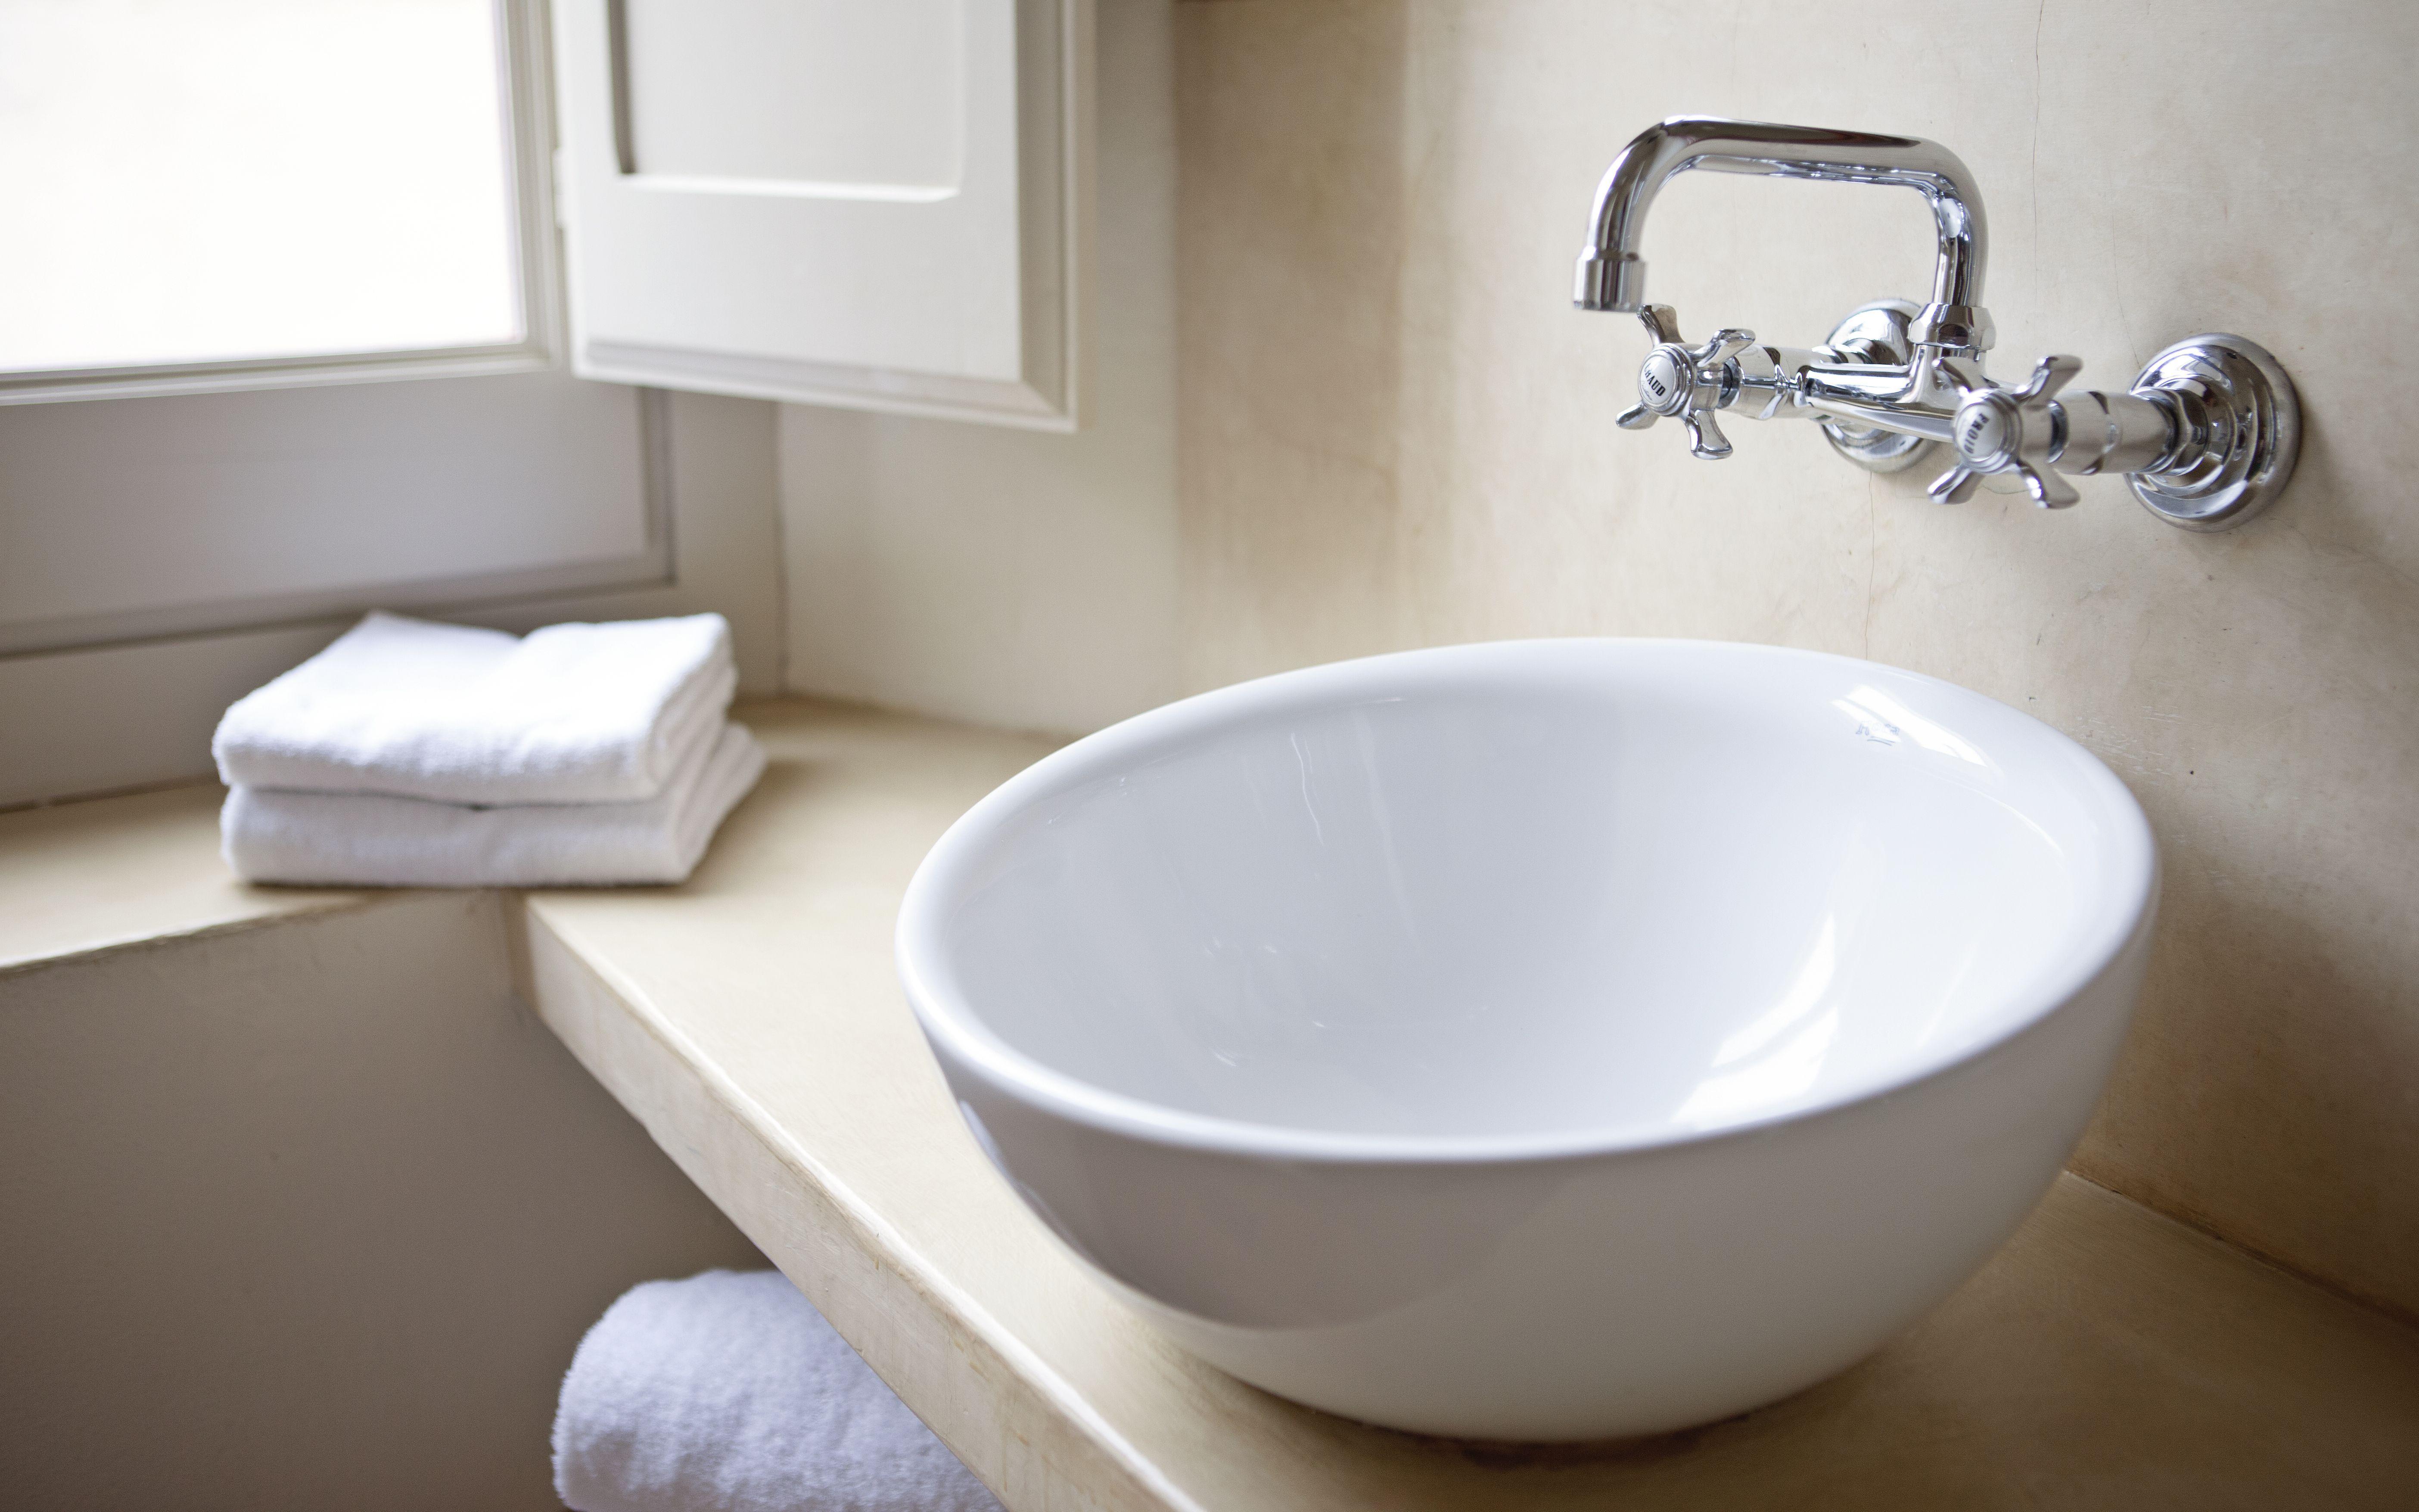 How To Install A Vessel Sink In A Bathroom Bathroom Sink Decor